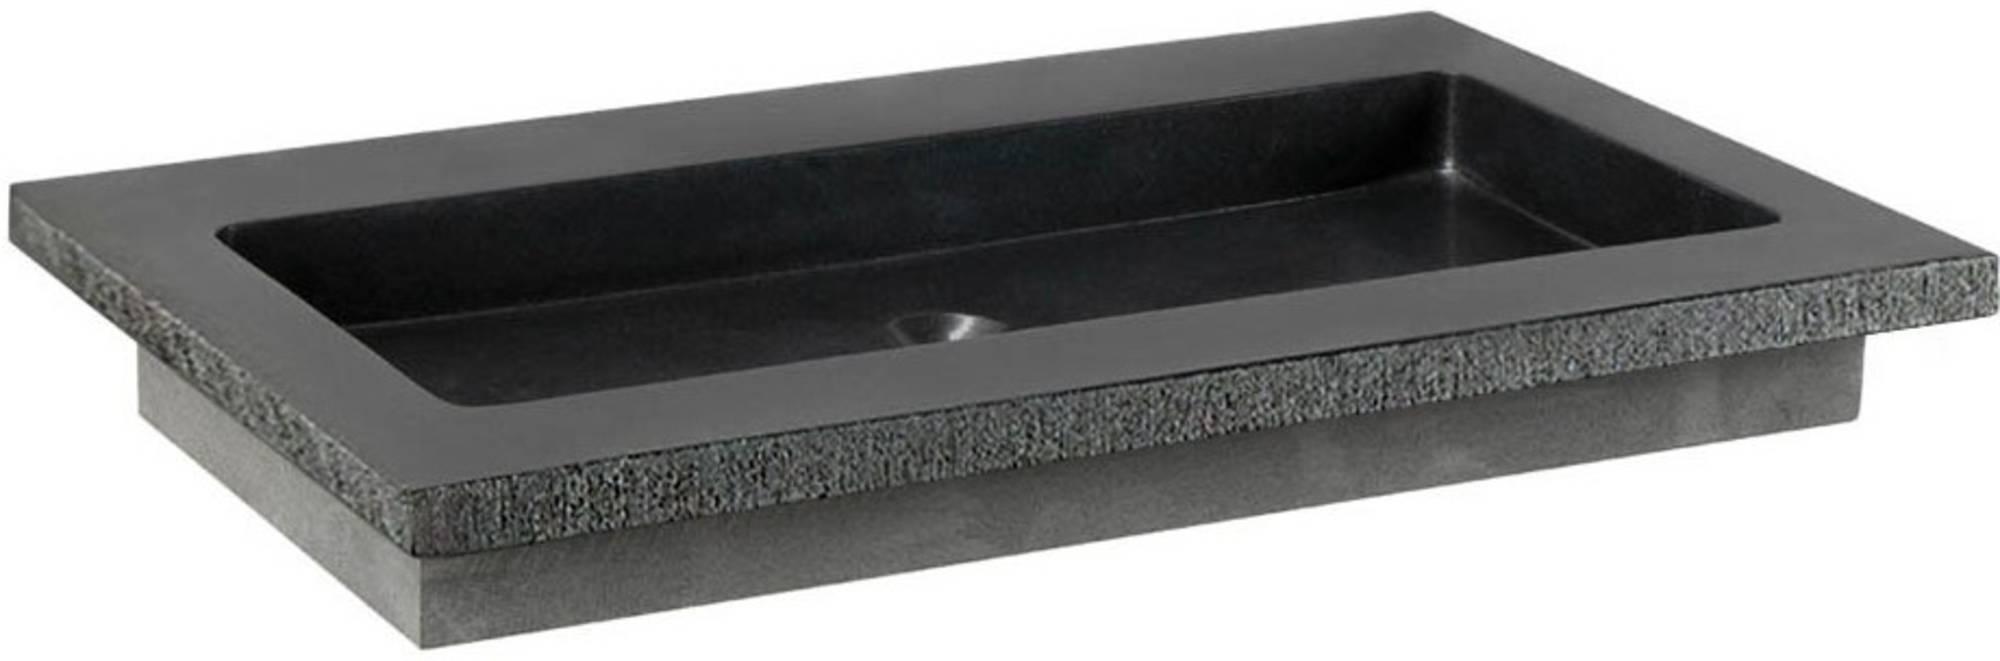 Ben Naturno Wastafel Graniet Gezoet Gefrijnd 60,5x51,5x3 cm 1 Krg. Zwart